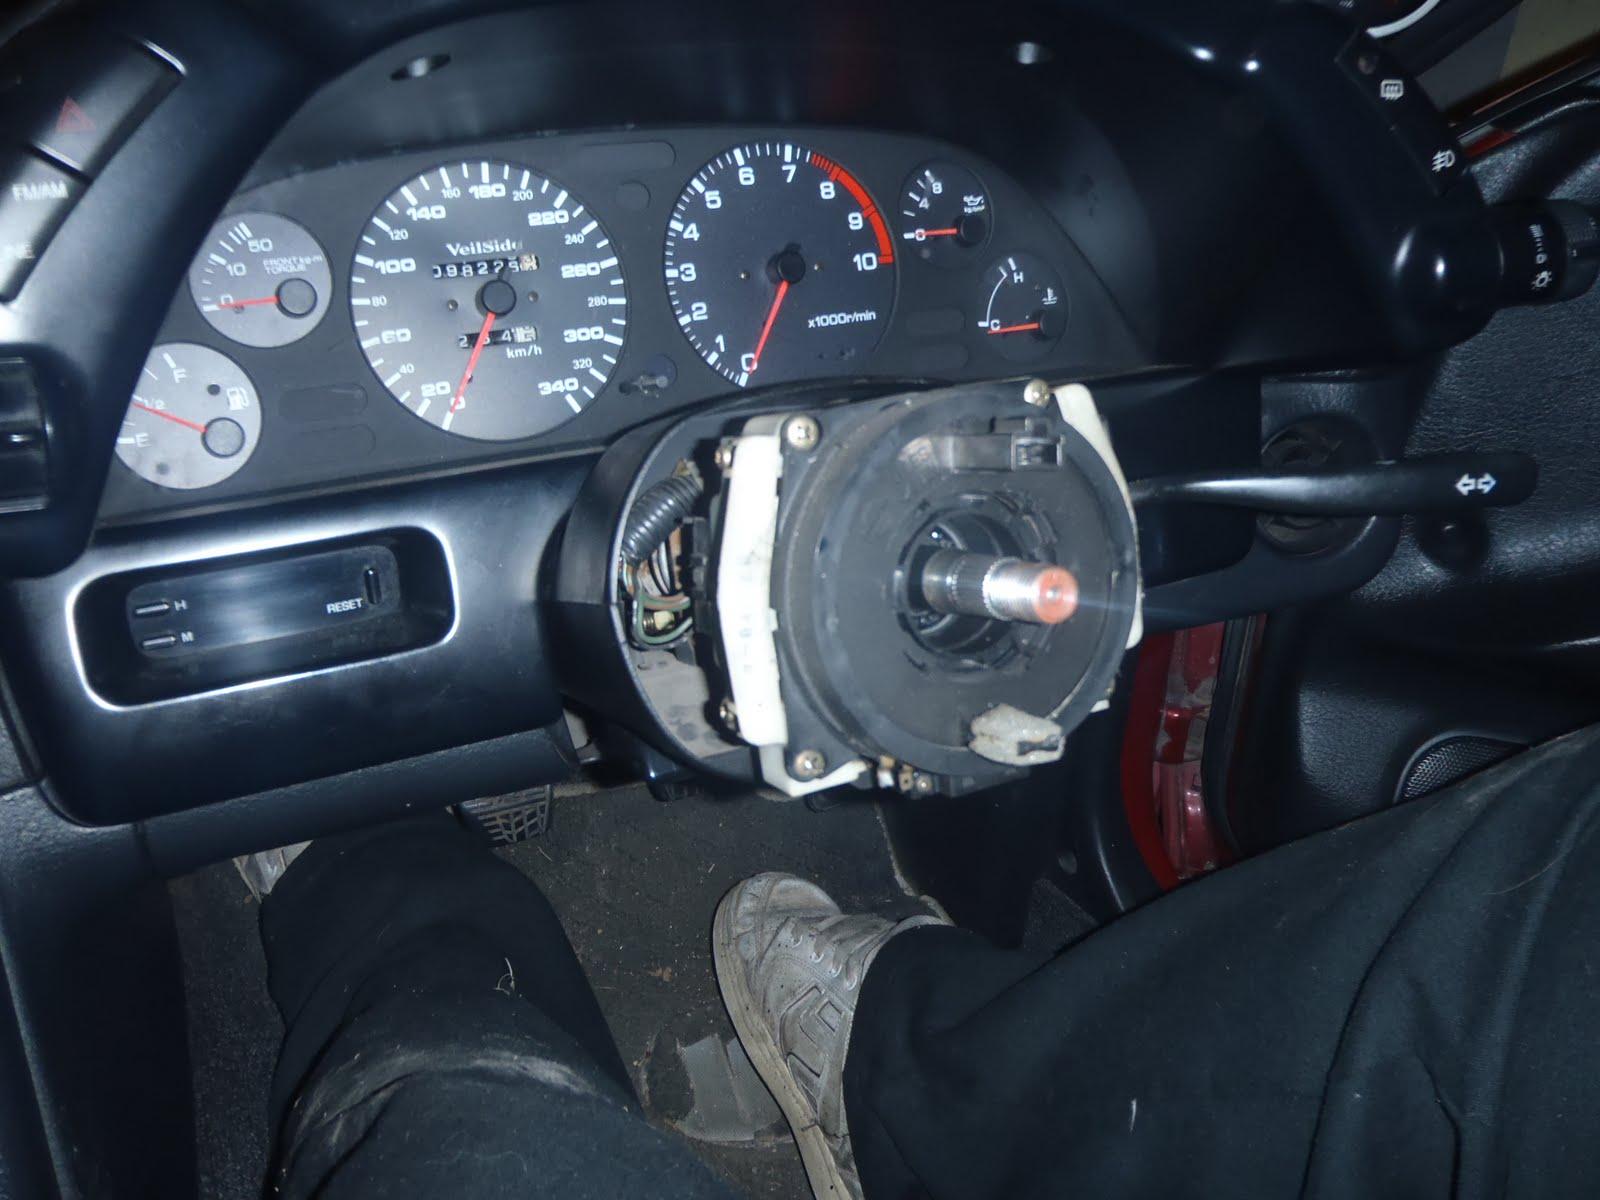 R33 Gtr Ecu Pinout Diagram Product Wiring Diagrams R32 Steering Wheel Extender 01 Hyundai Sonata 95